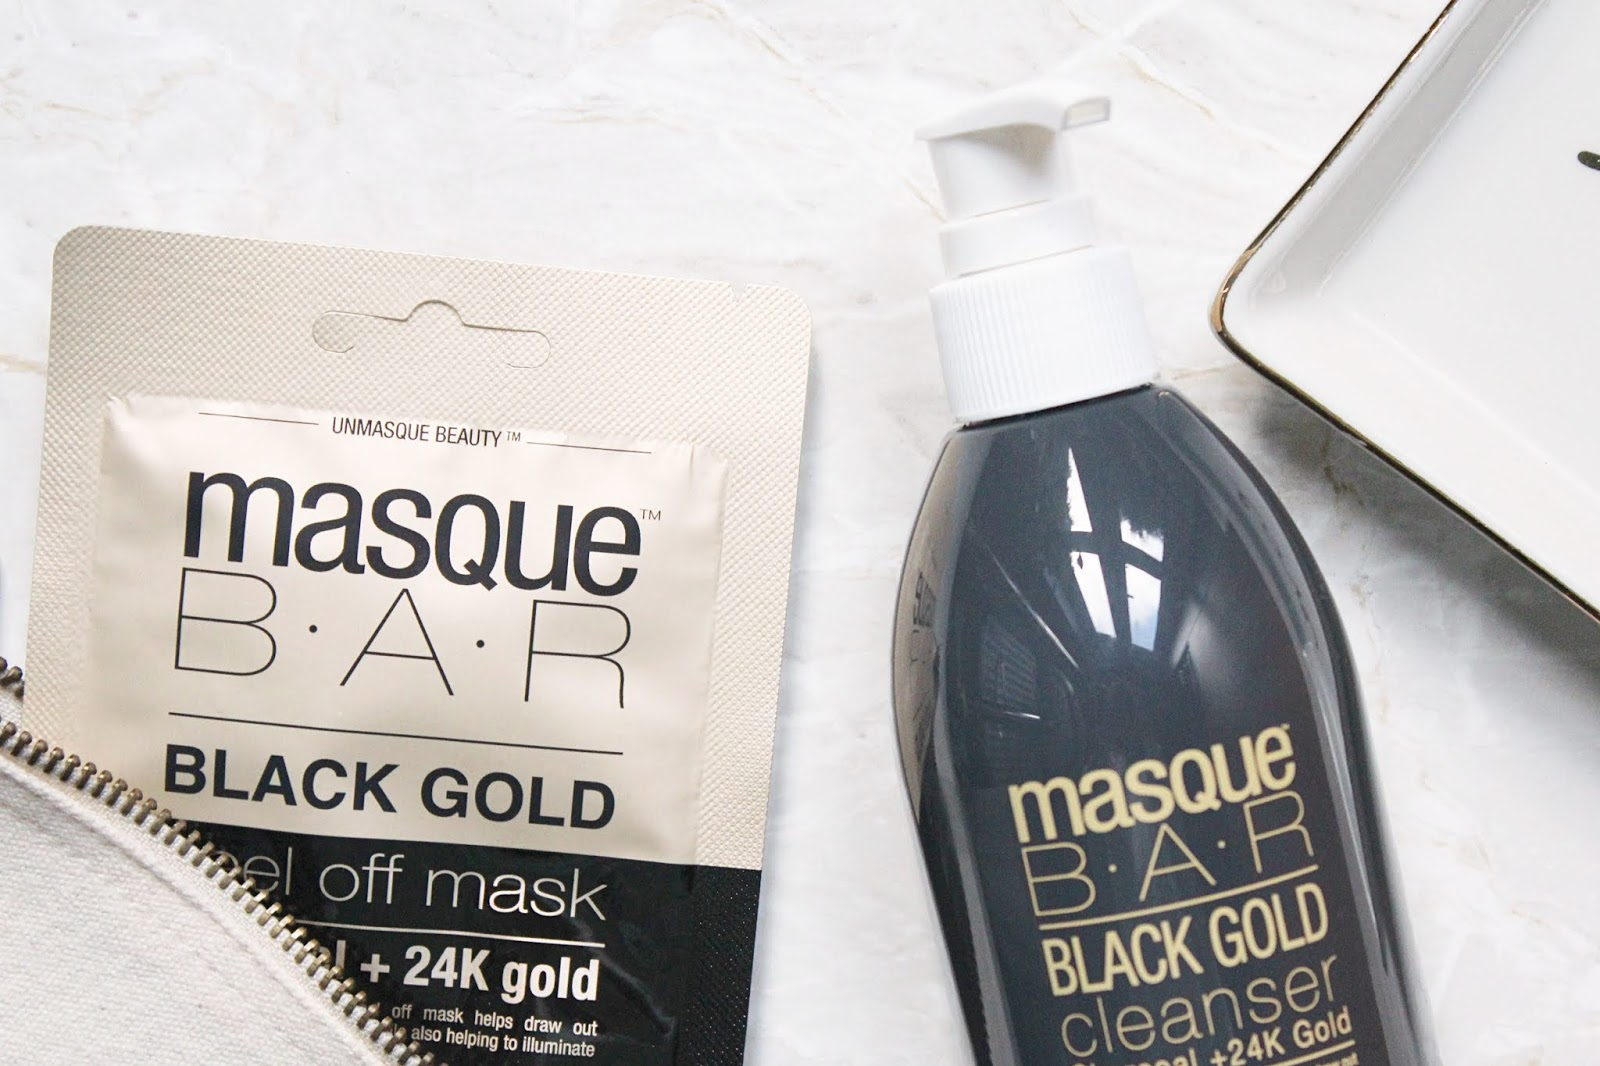 MasqueBAR Black Gold Skincare